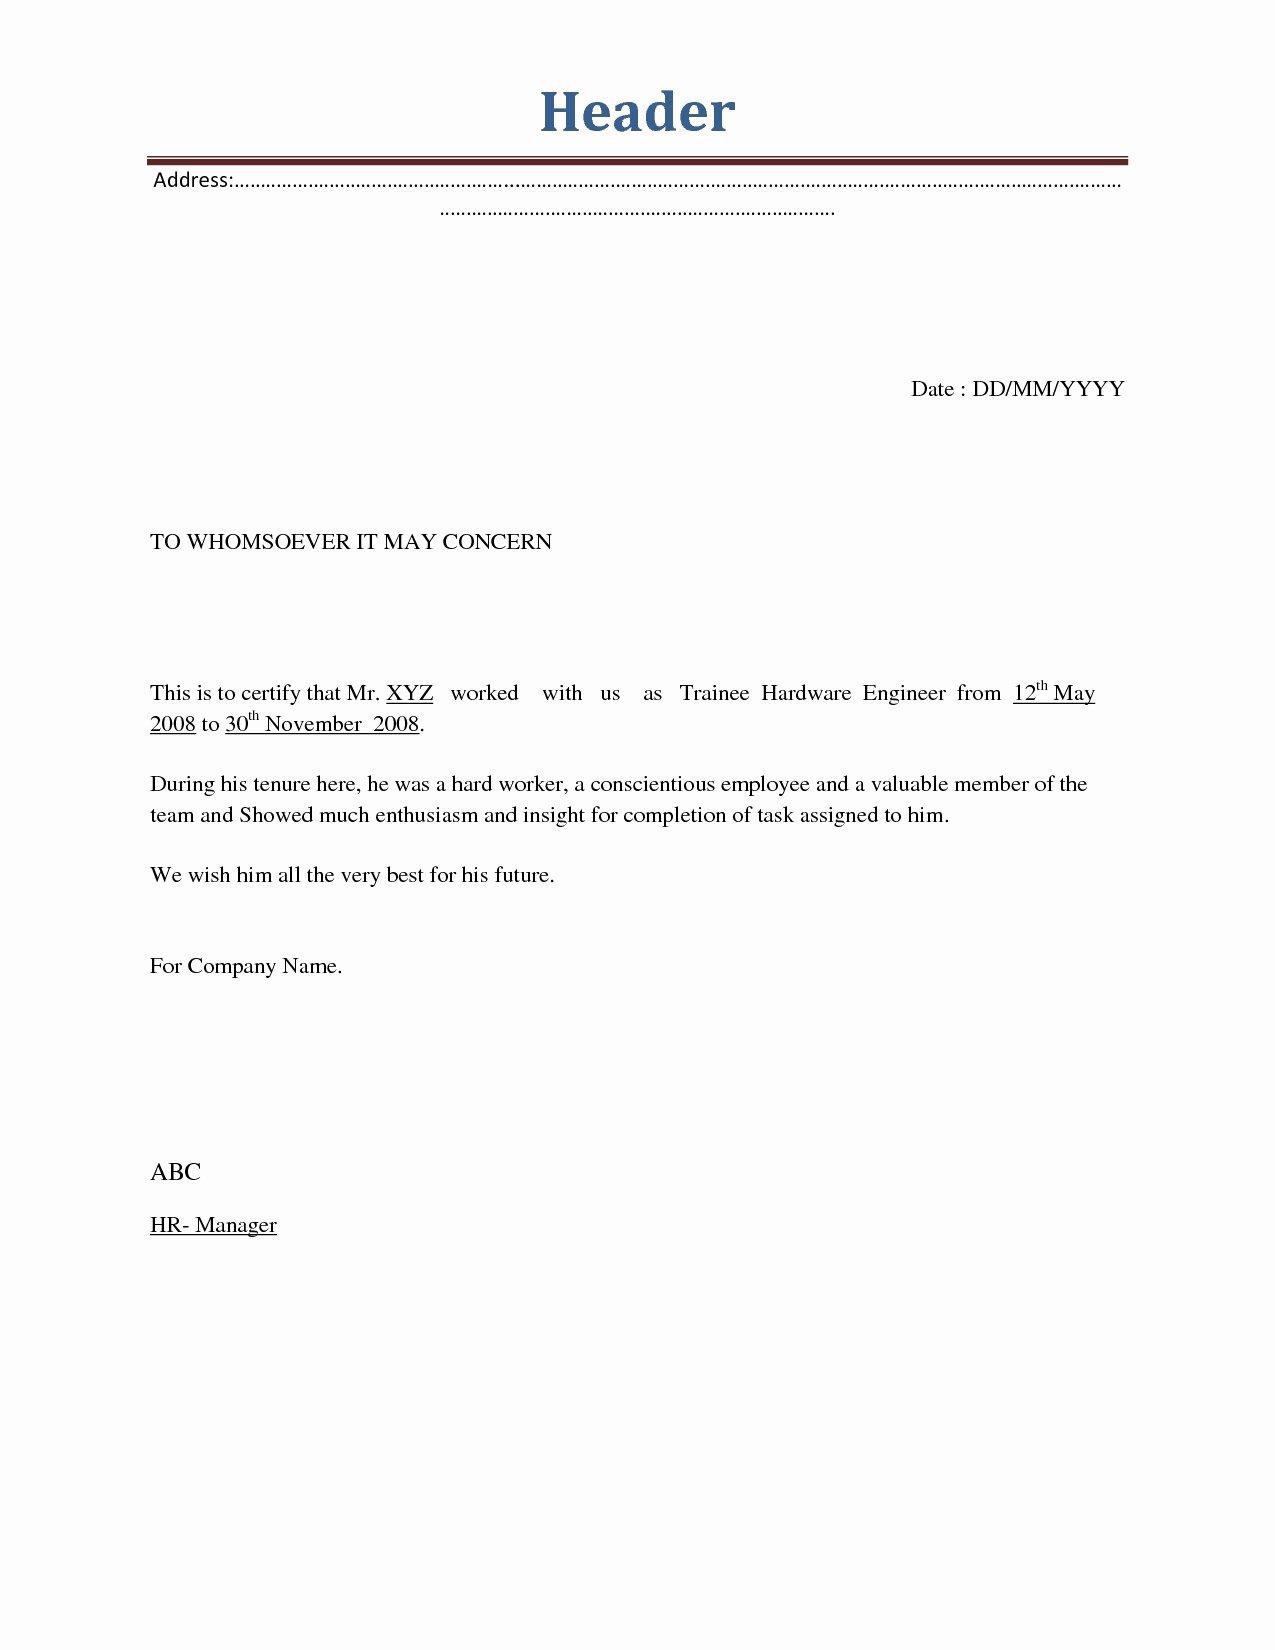 Sample Termination Of Employment Letter Lovely Sample Severance Letter to Employee